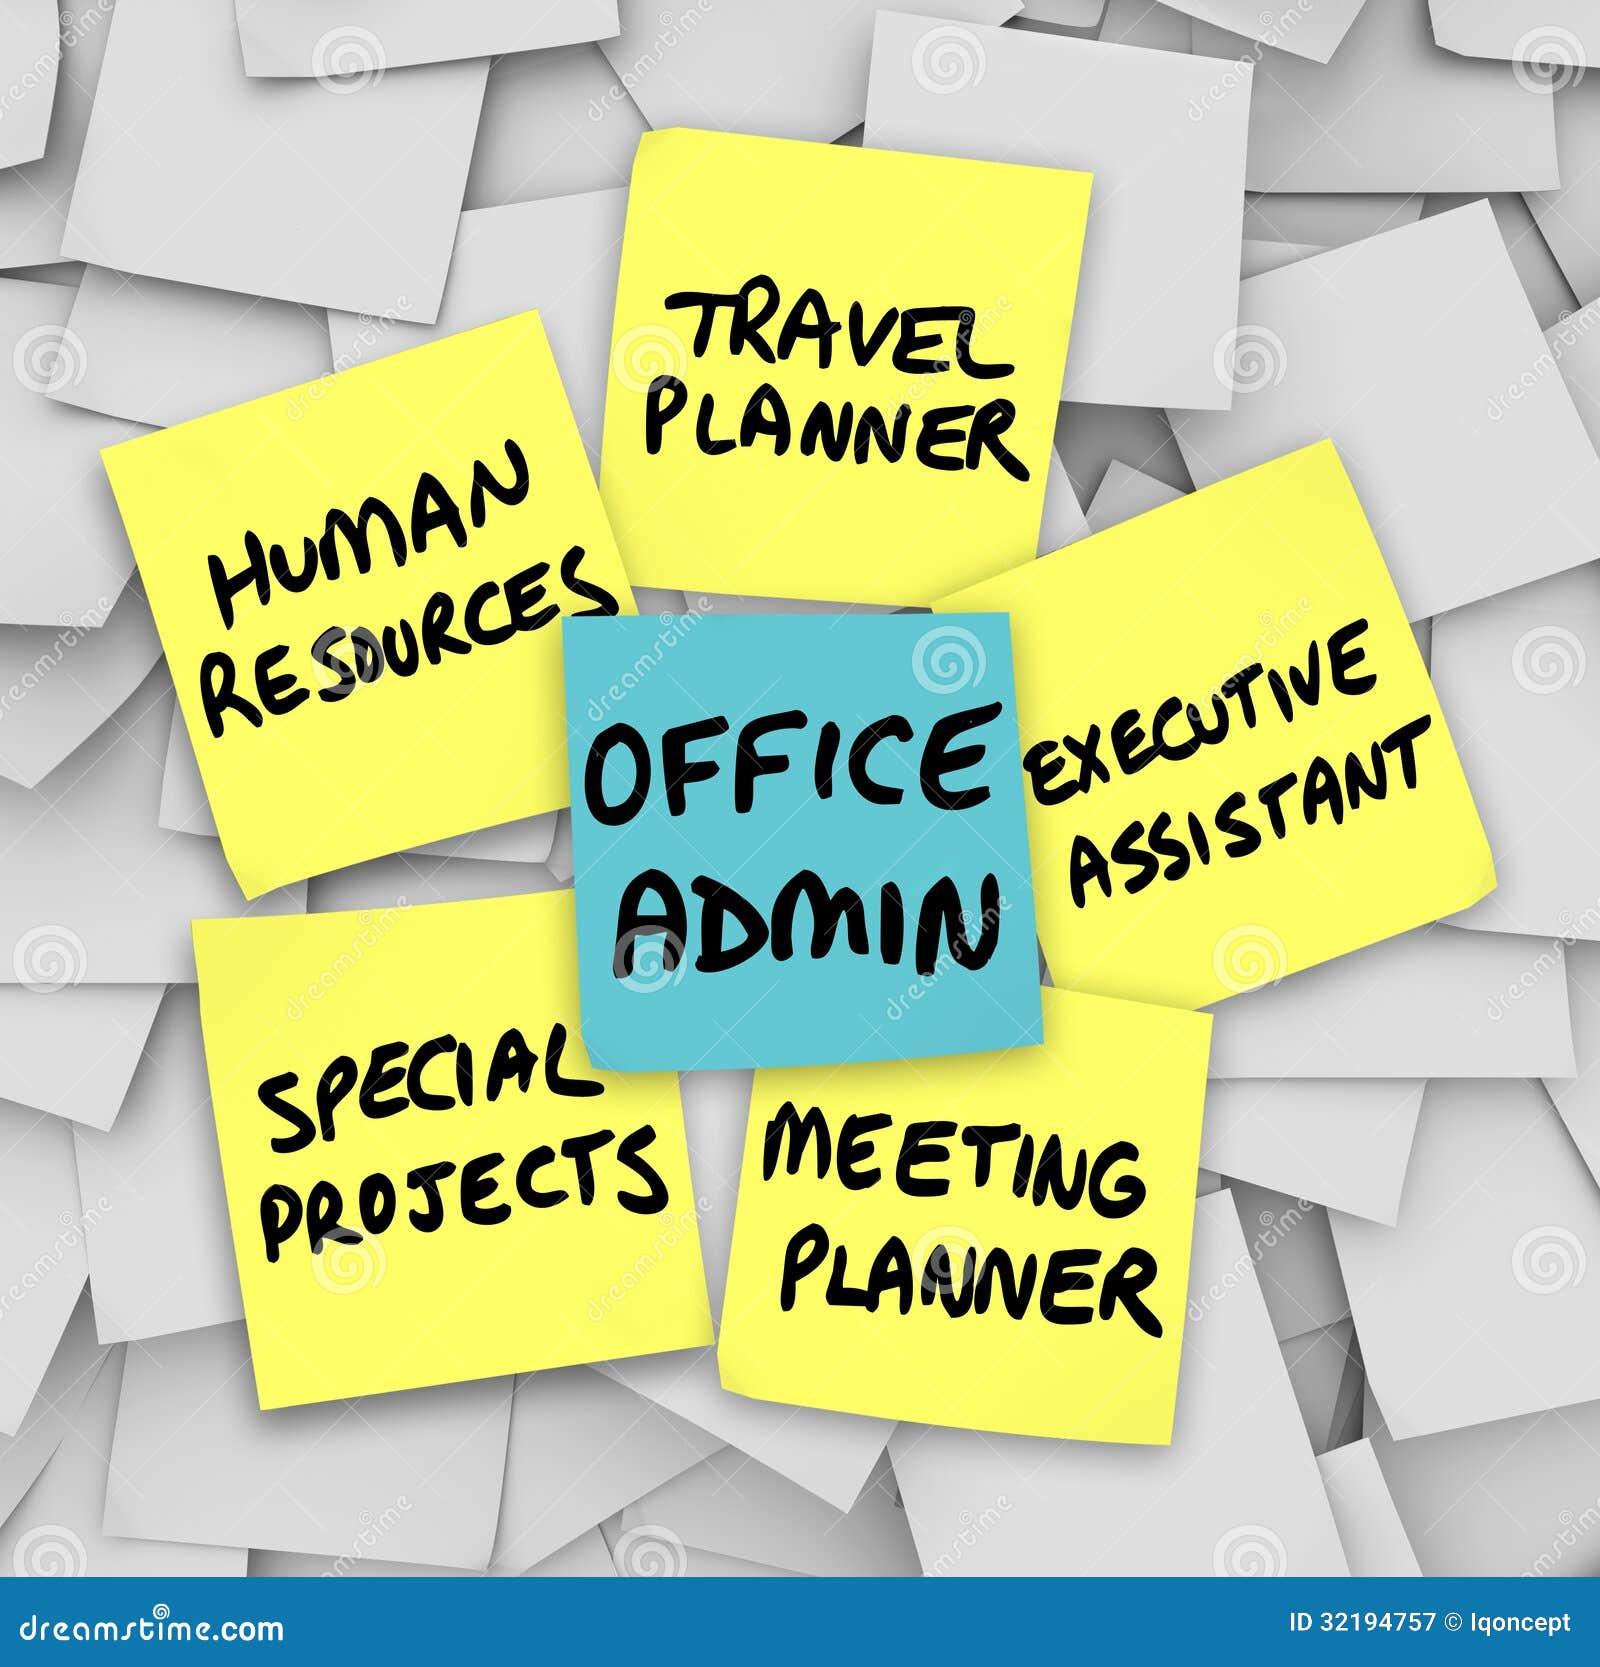 Office Administrator Job Duties Meeting Travel Planner